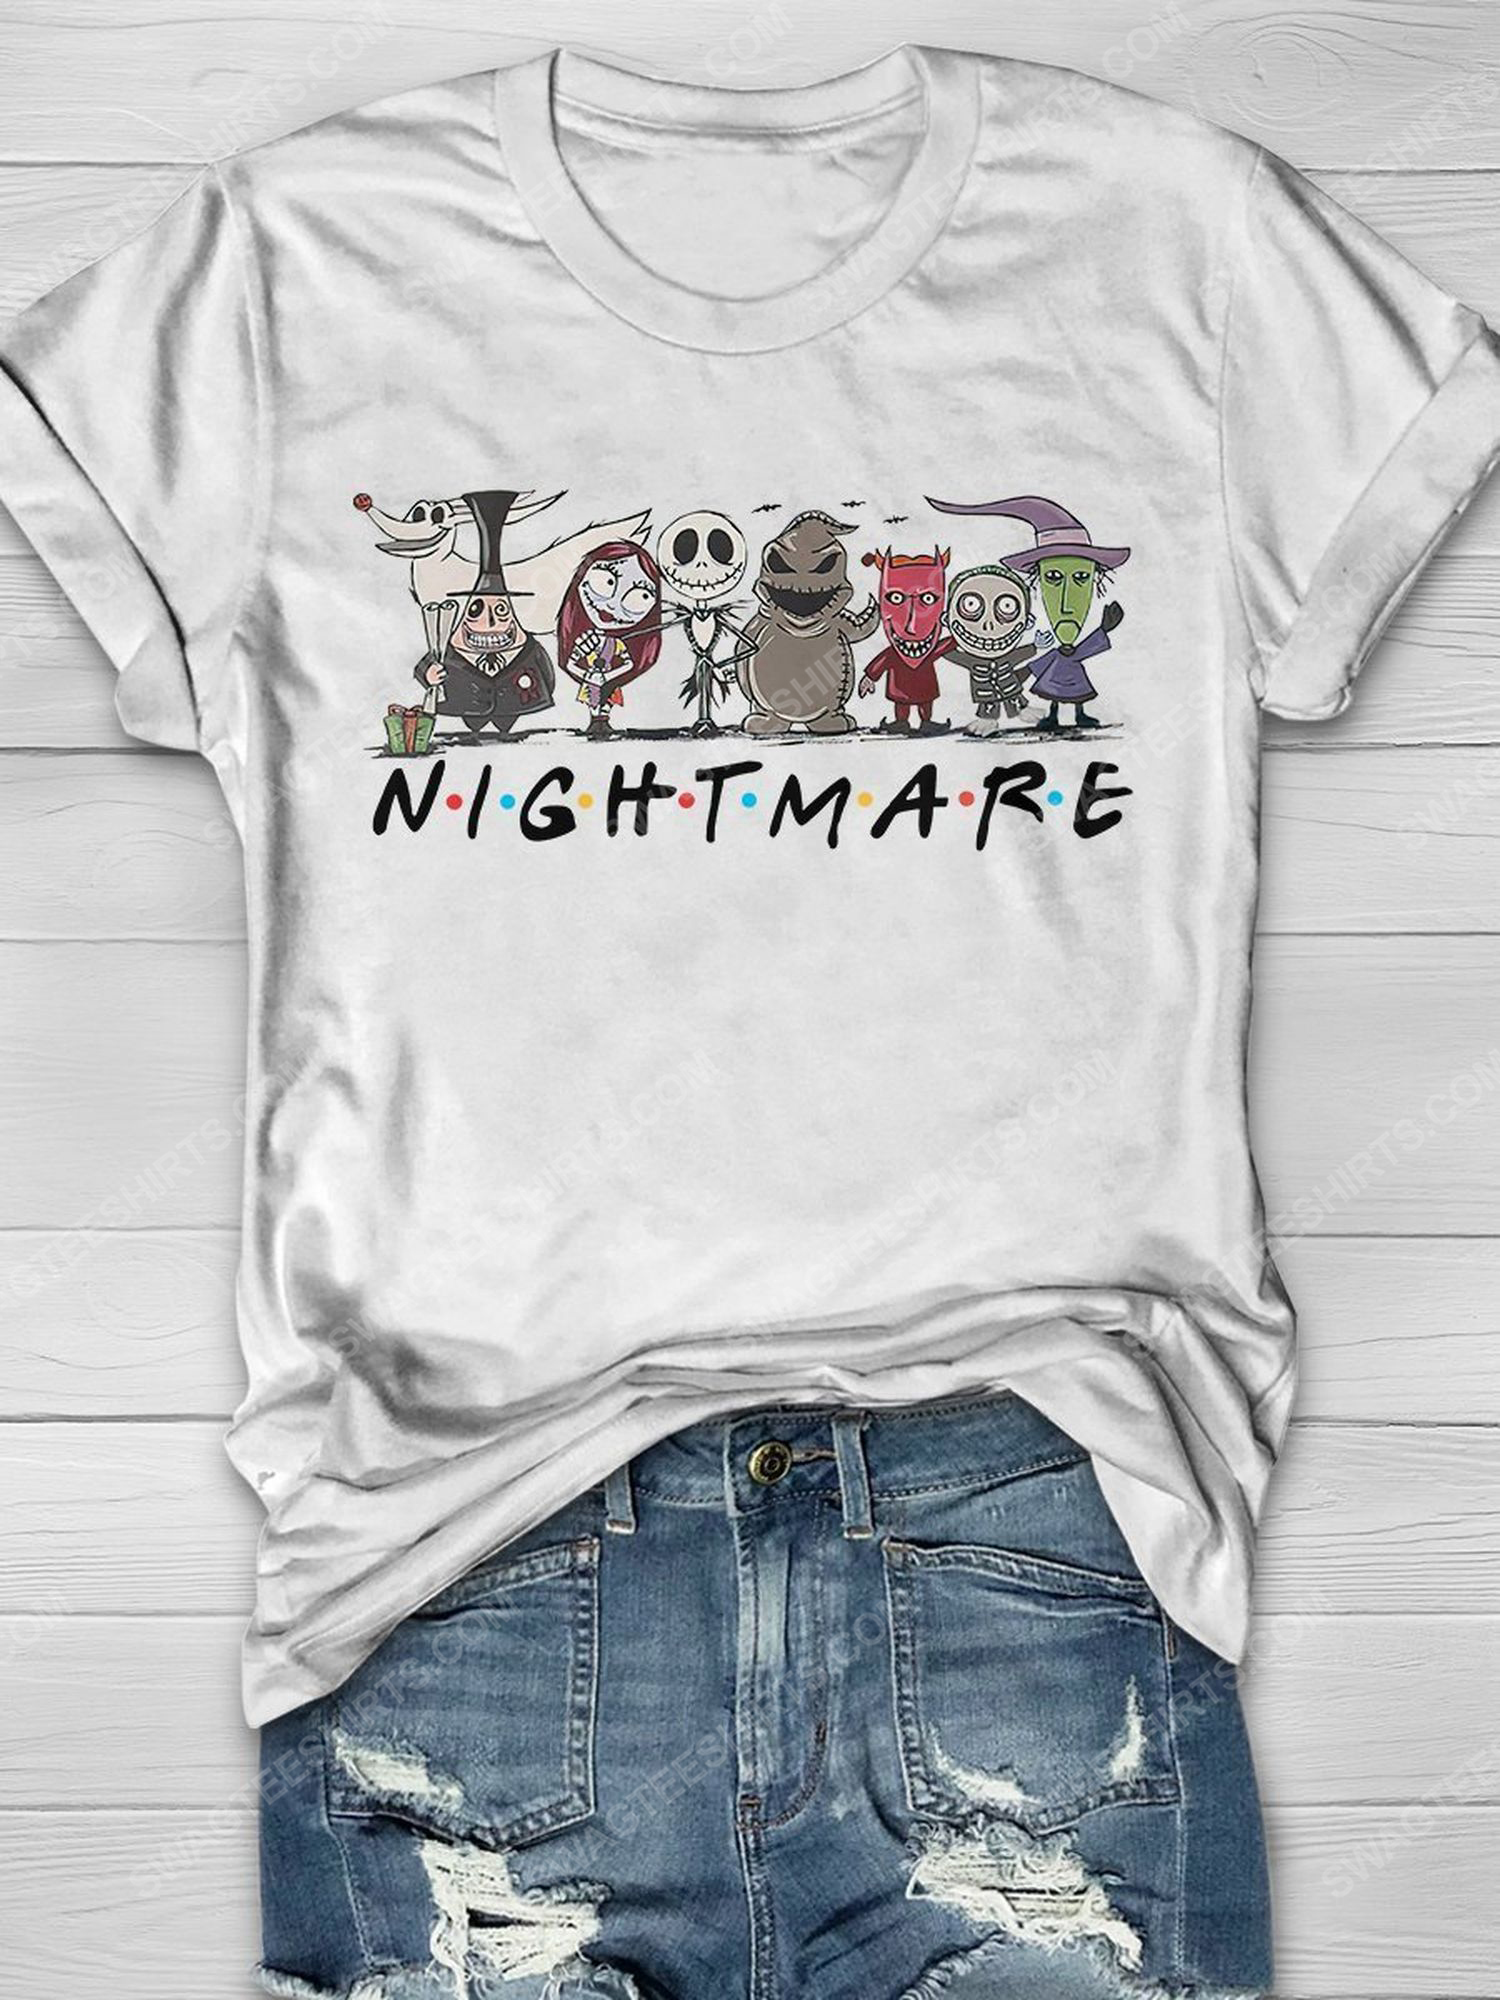 The nightmare before christmas friends tv show shirt 1 - Copy